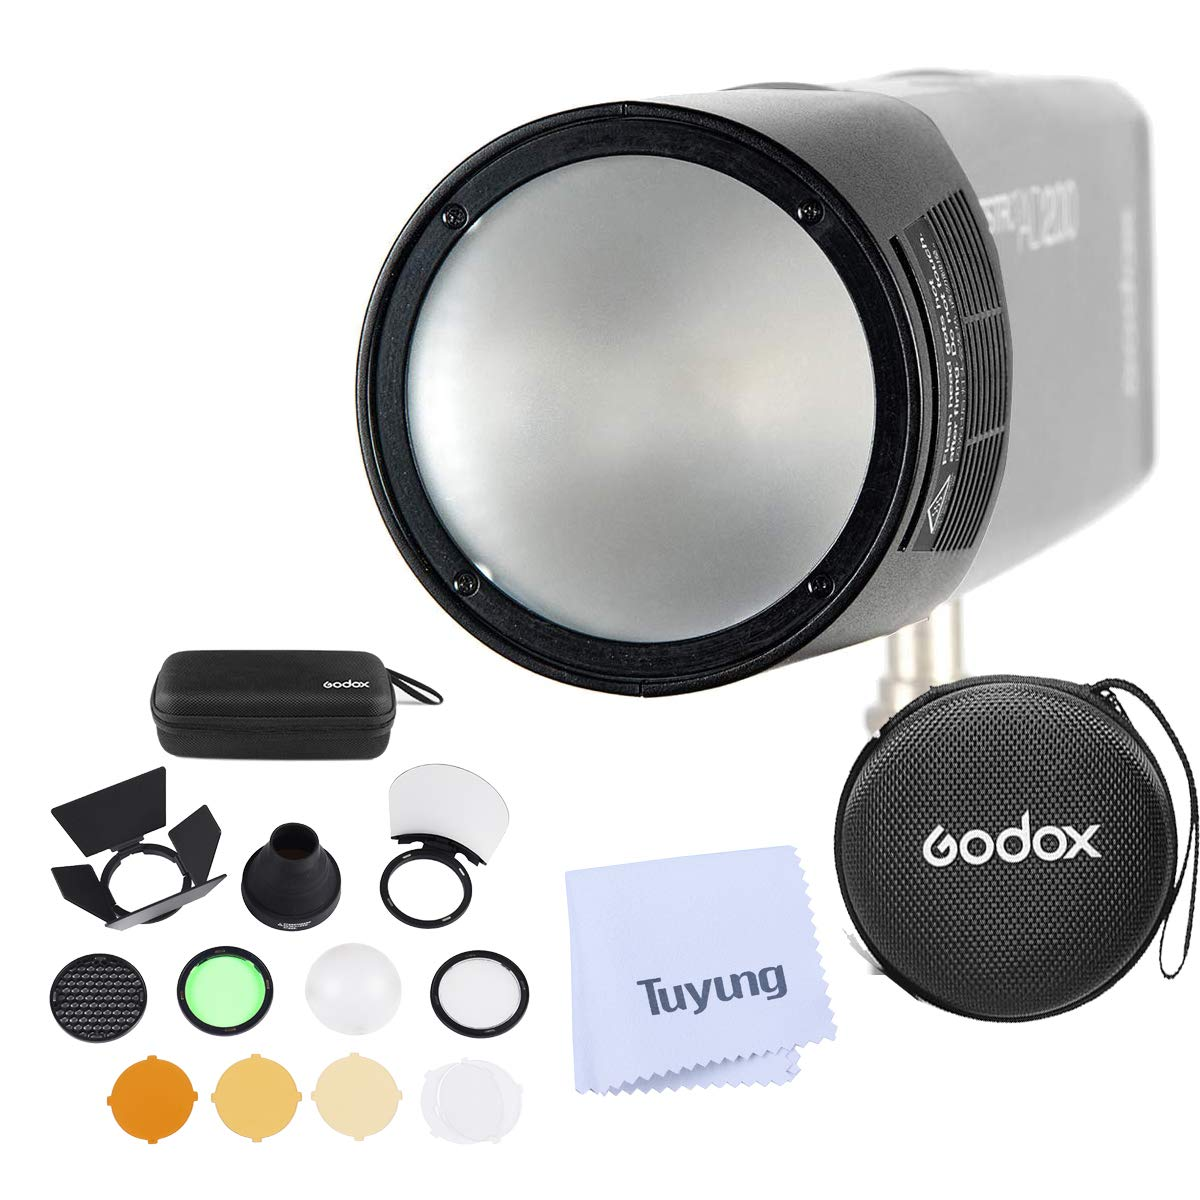 Godox H200R Round Flash Head and Godox AK-R1 Accessories Kit Compatible for Godox AD200 AD200PRO Pocket Flash Light by Godox